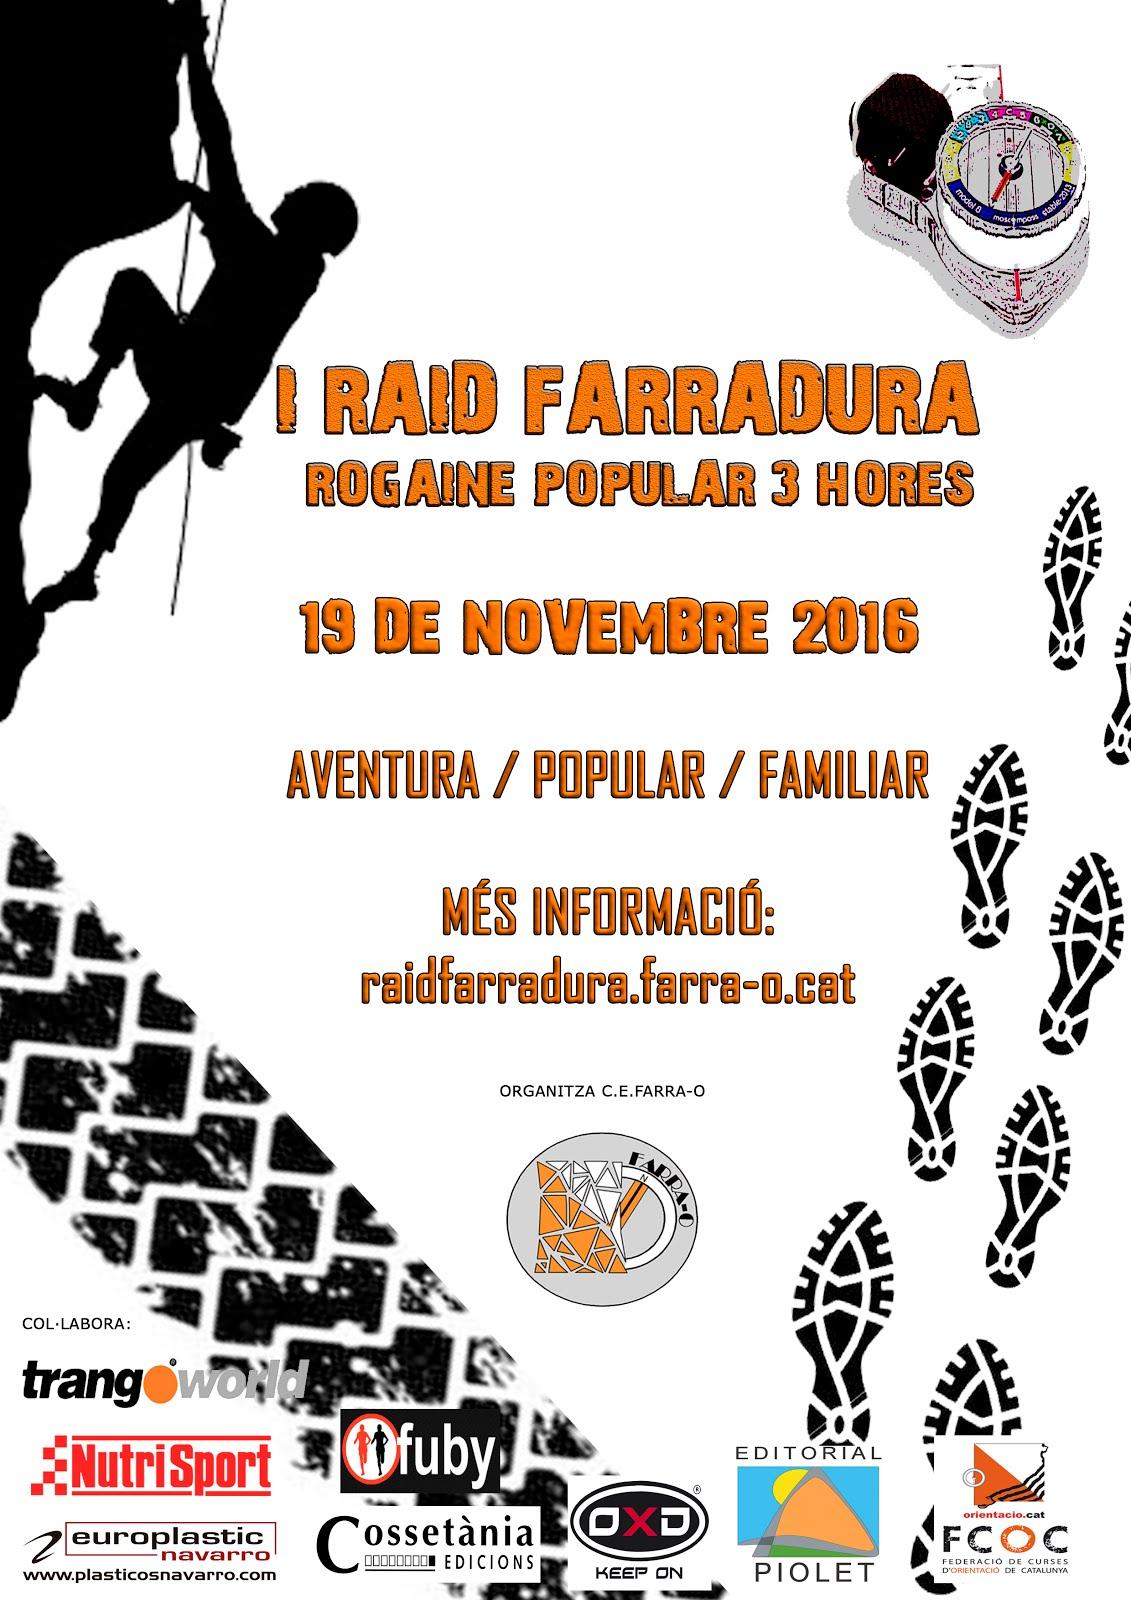 19/11/2016 - I RAID FARRADURA - ROGAINE POPULAR